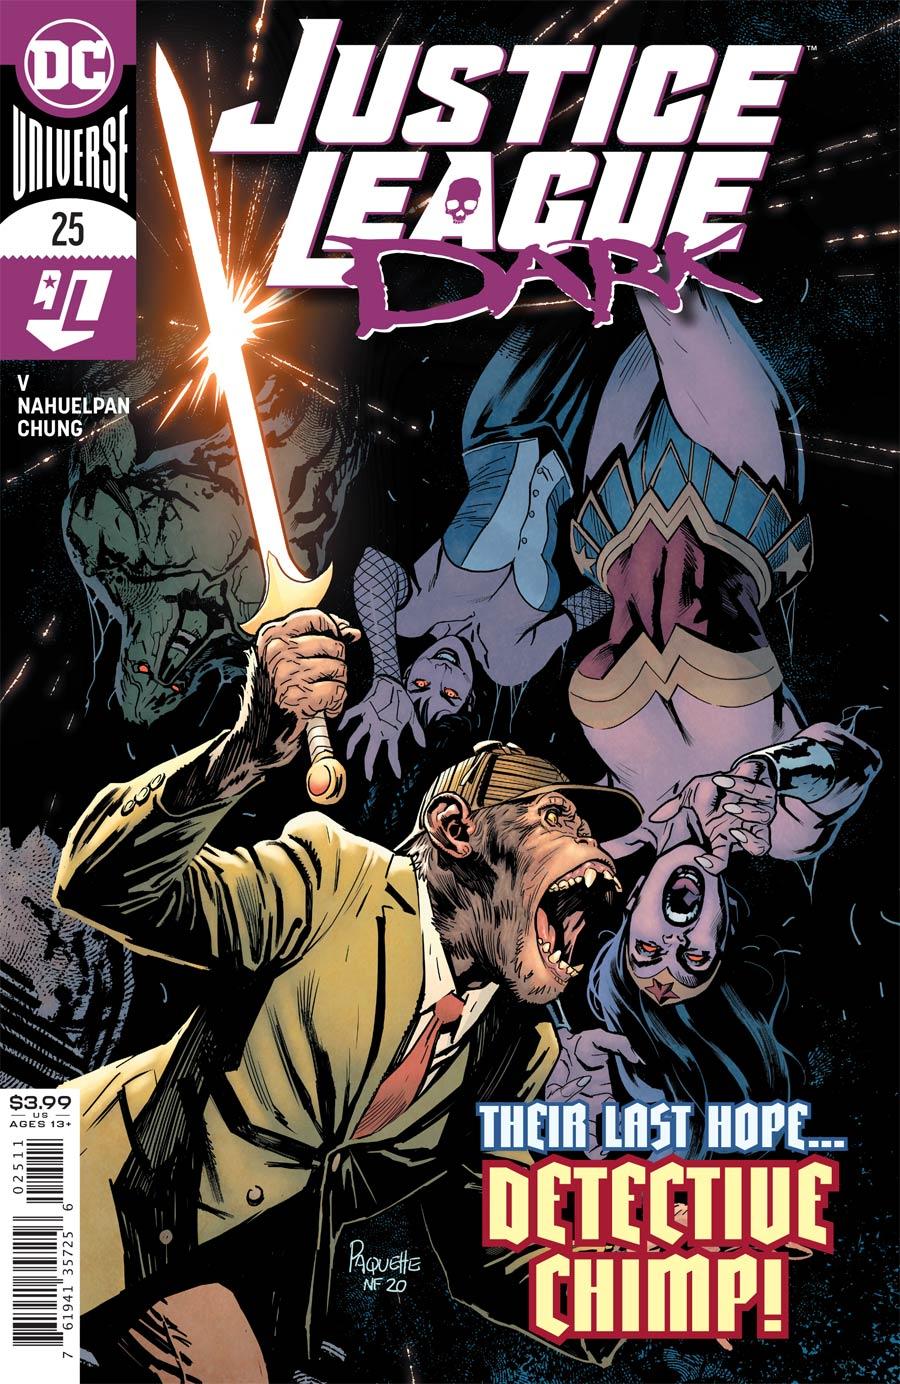 Justice League Dark Vol 2 #25 Cover A Regular Yanick Paquette Cover